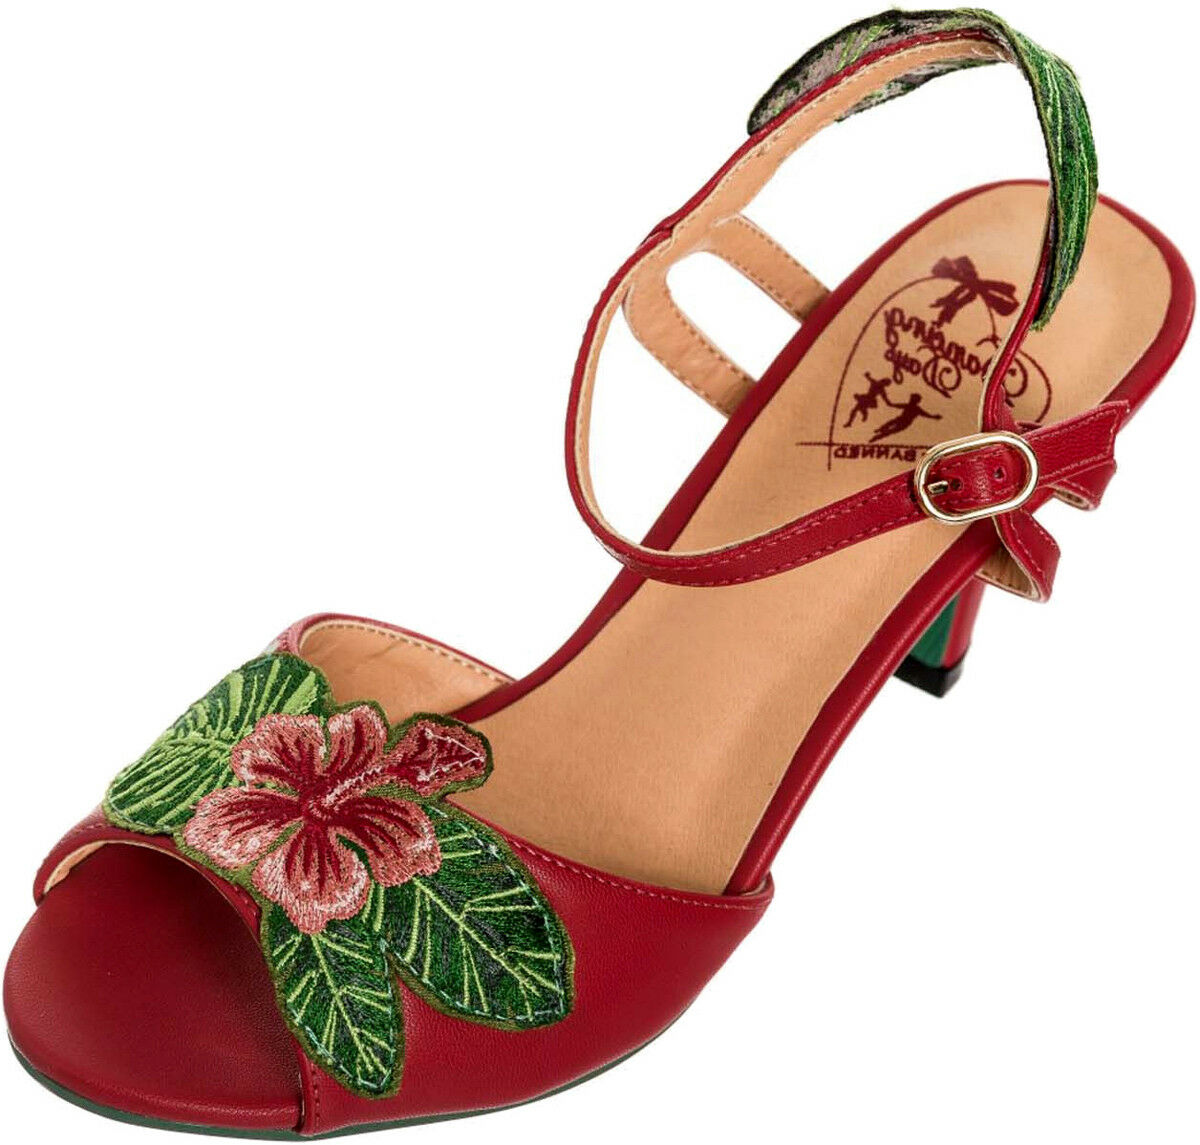 Dancing Days de abril Aloha Tiki Tiki Tiki Hibiscus vintage PEEP TOE decorado rockabilly  en venta en línea